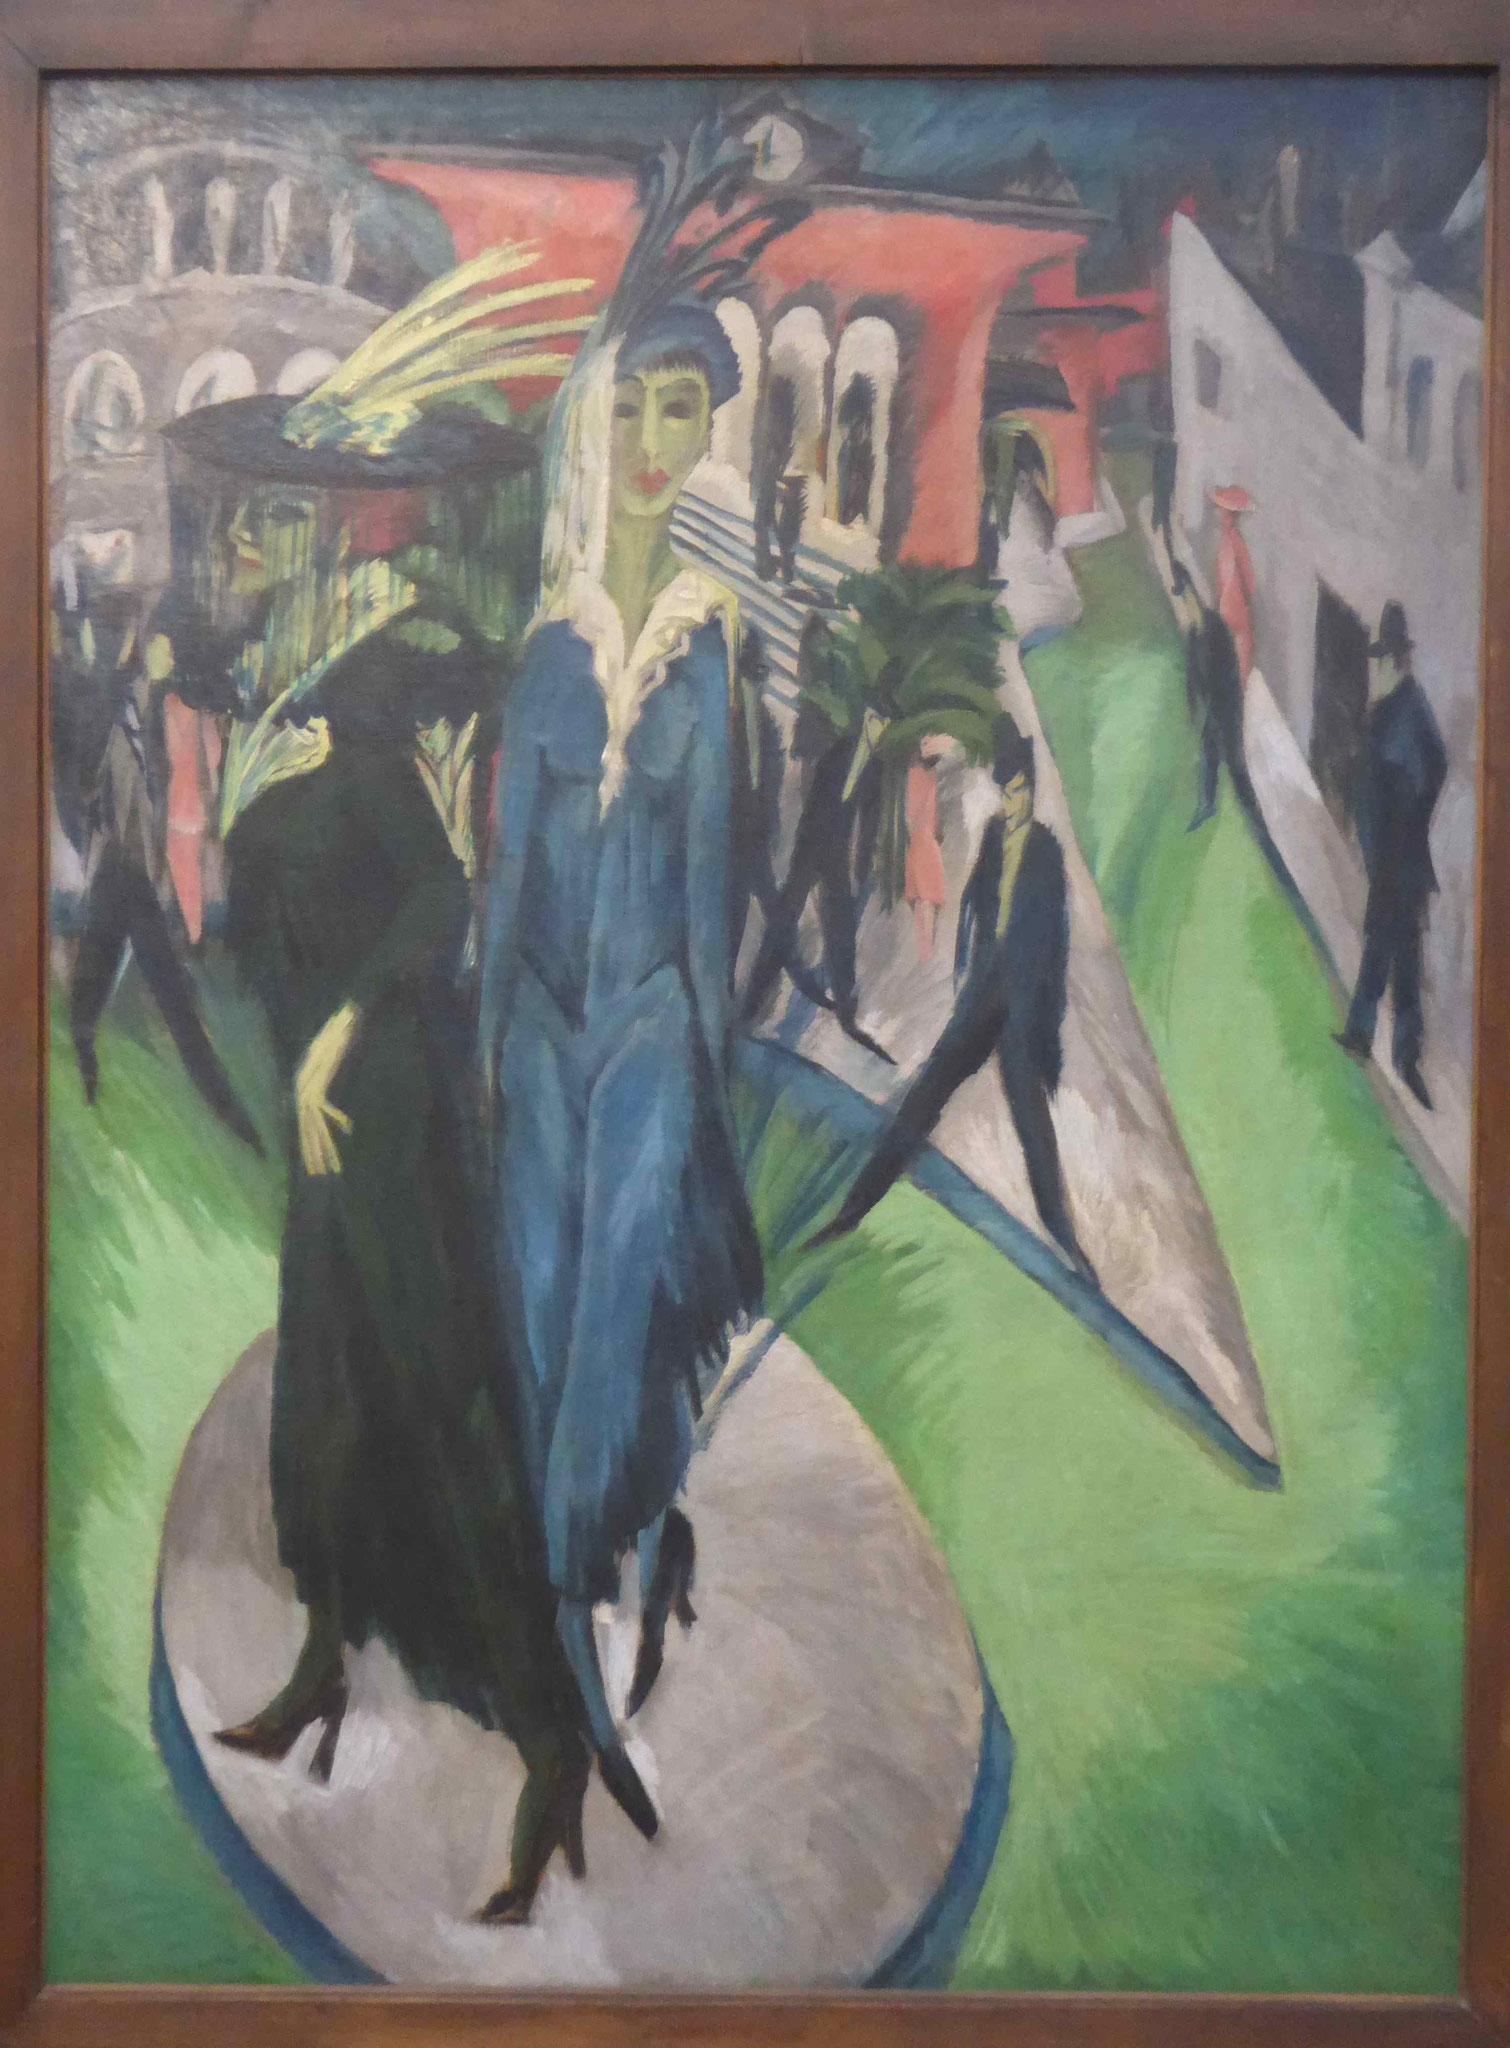 Ernst Ludwig Kirchner, Im Ex, Nationalgalerie Beerlin